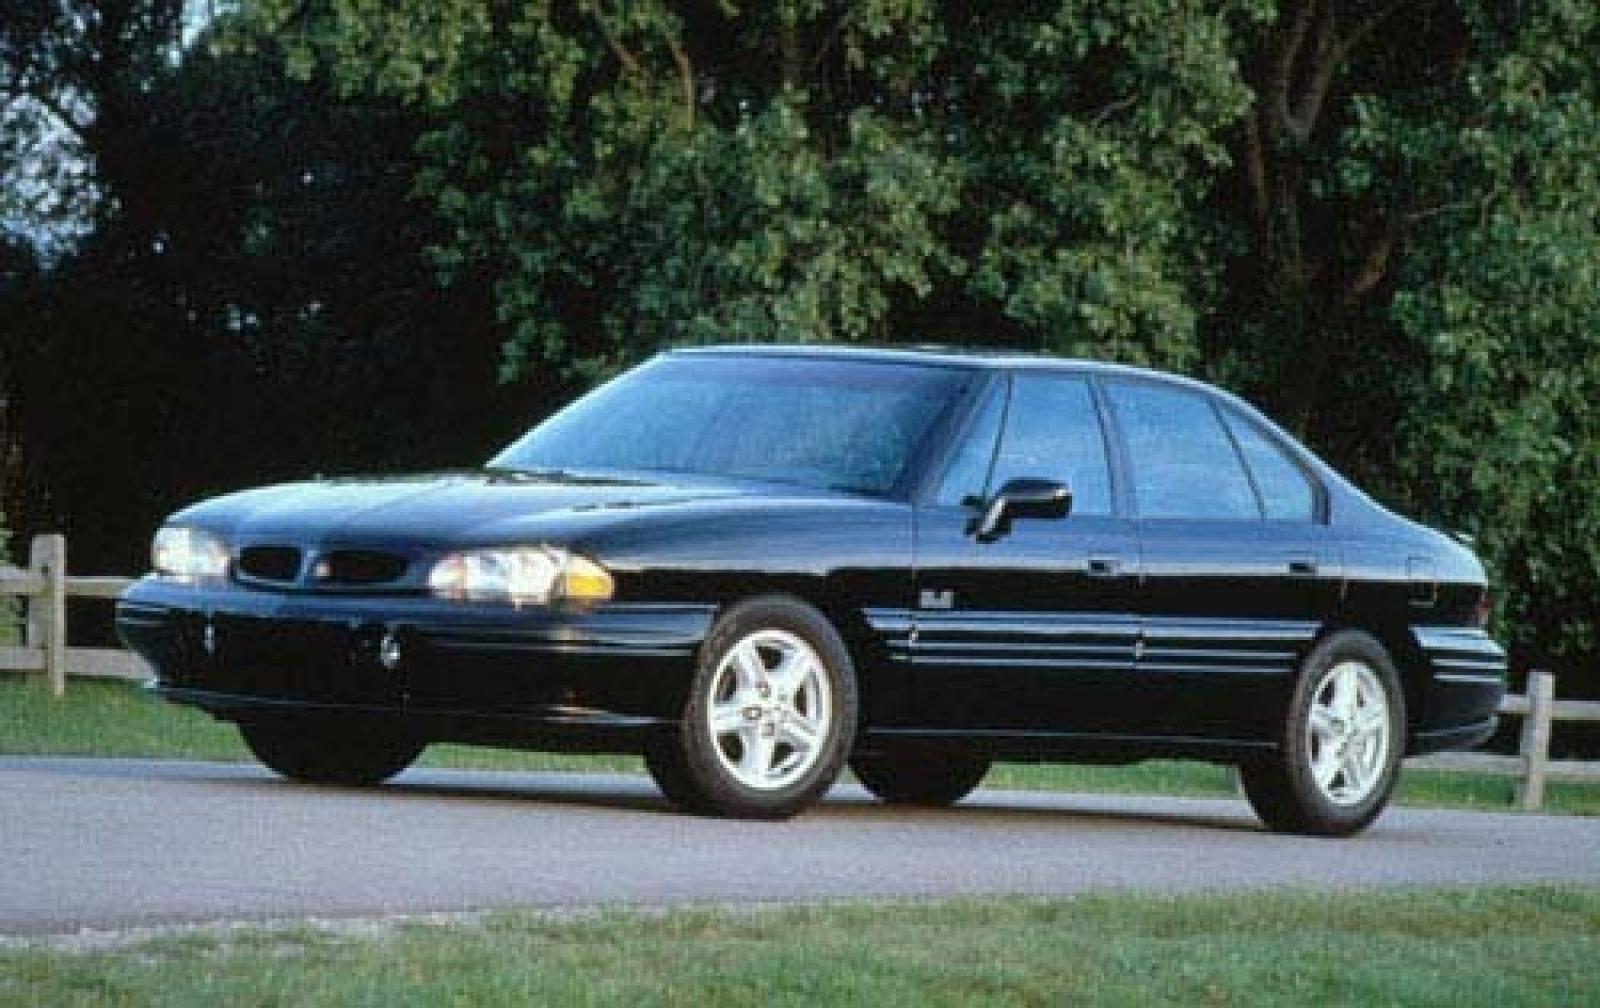 ... 1998 Pontiac Bonneville 4 exterior #2 800 1024 1280 1600 origin ...